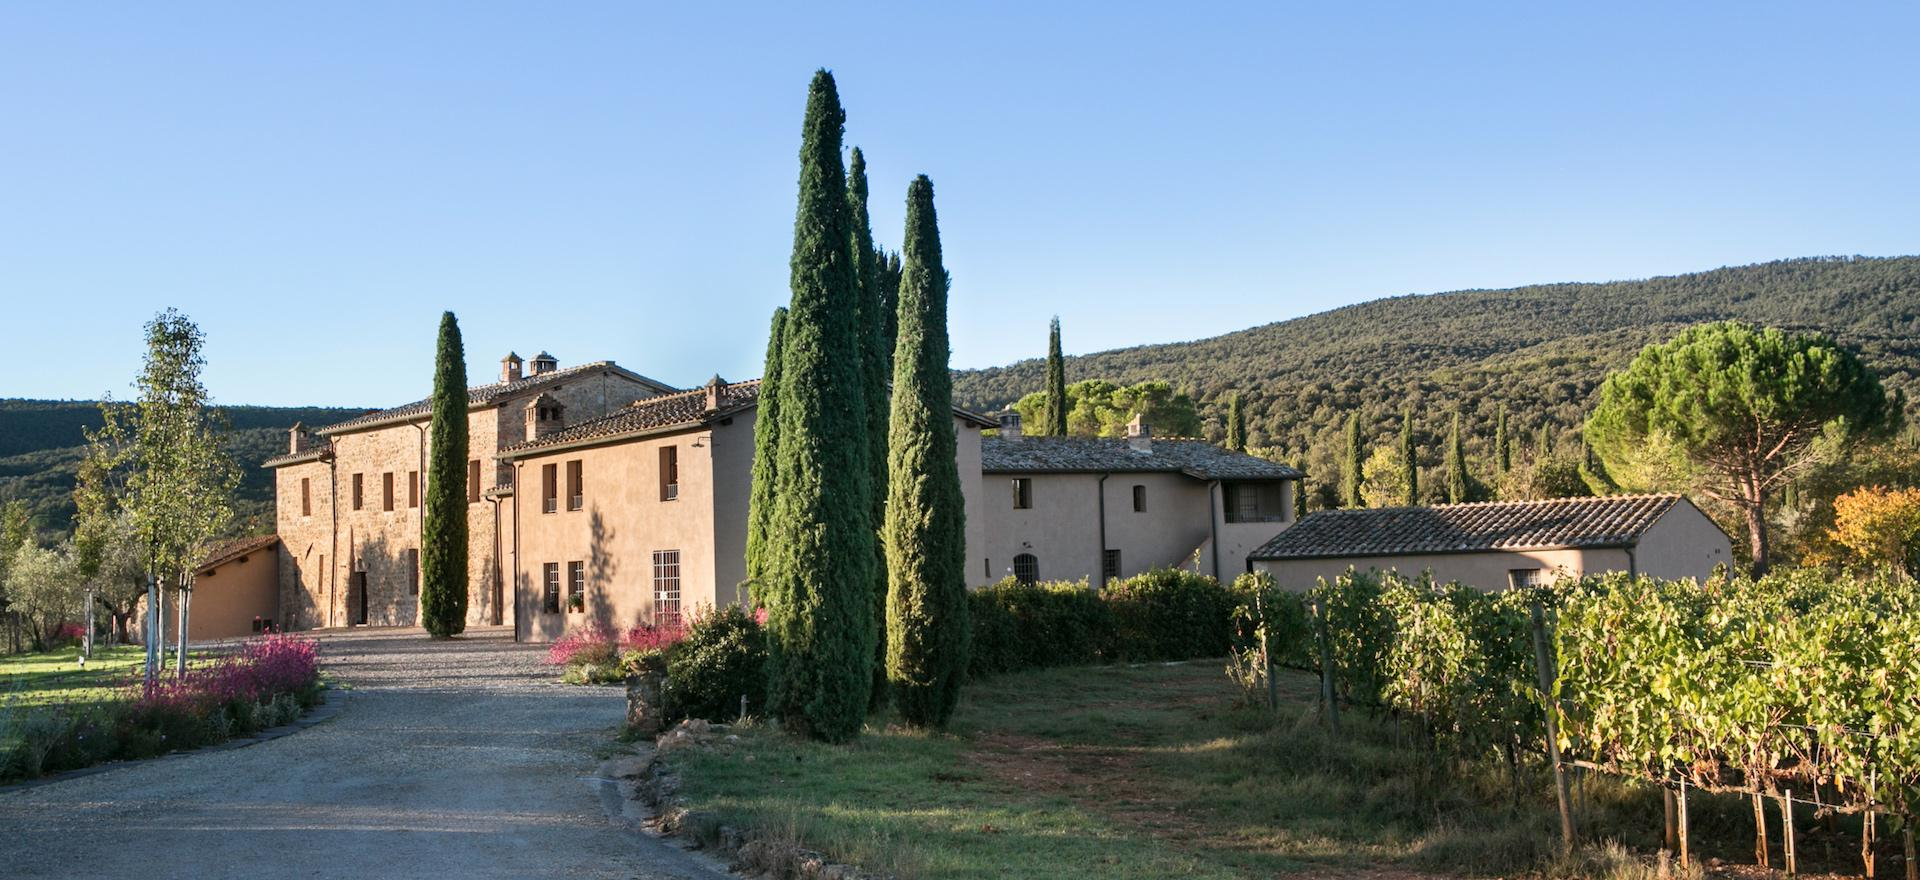 Agriturismo Toscana Agriturismo Toscana vicino ad un ottimo ristorante